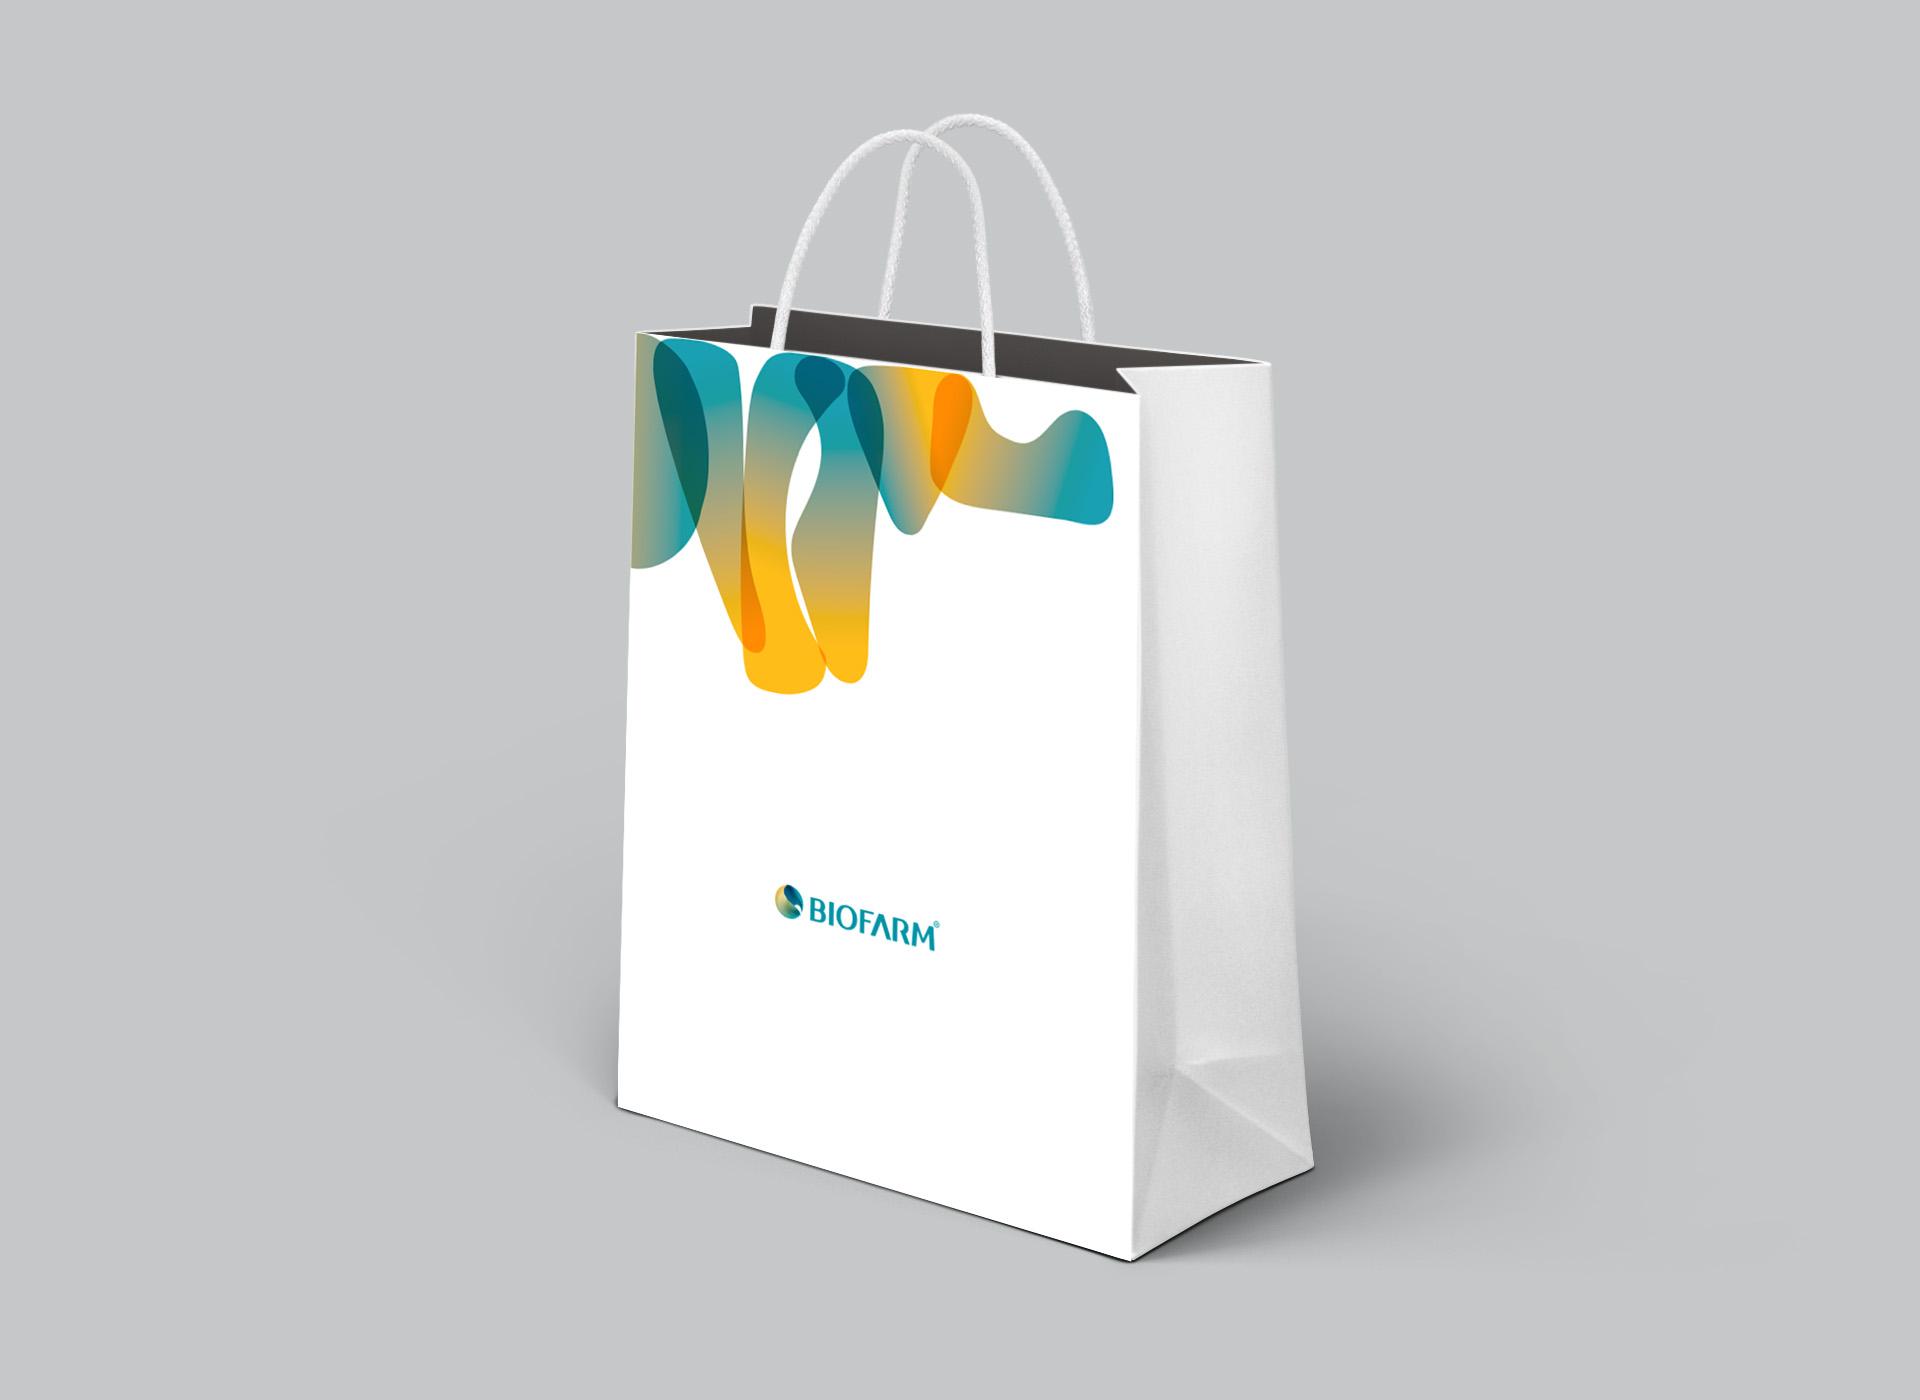 Biofarm portofoliu inoveo paper bag